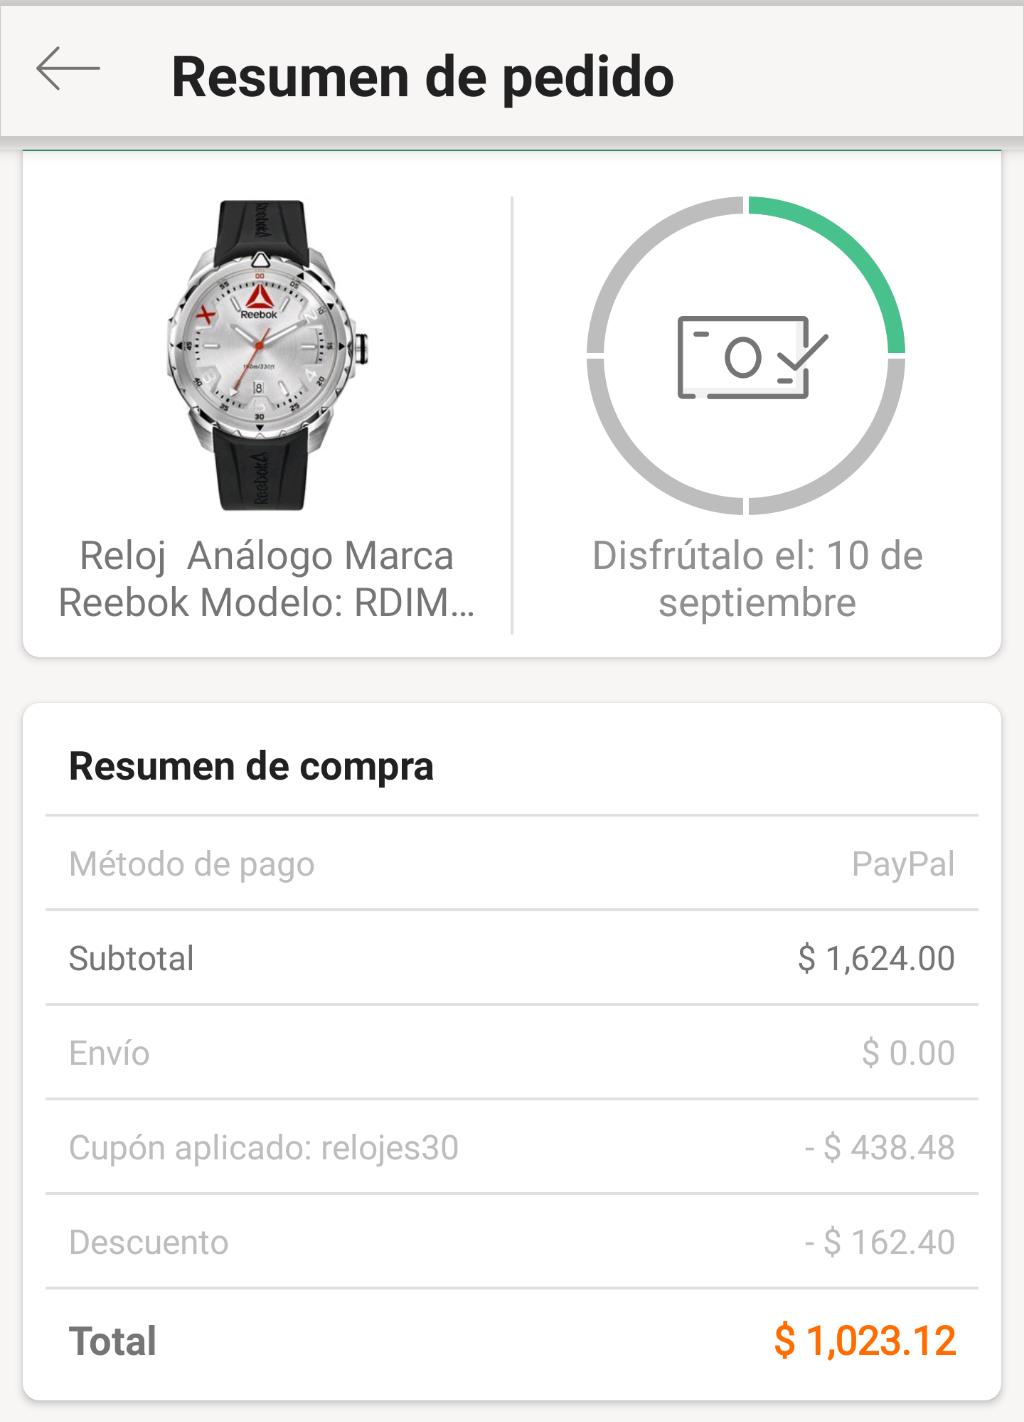 Linio: Reloj Reebok caballero (pagando con PayPal)